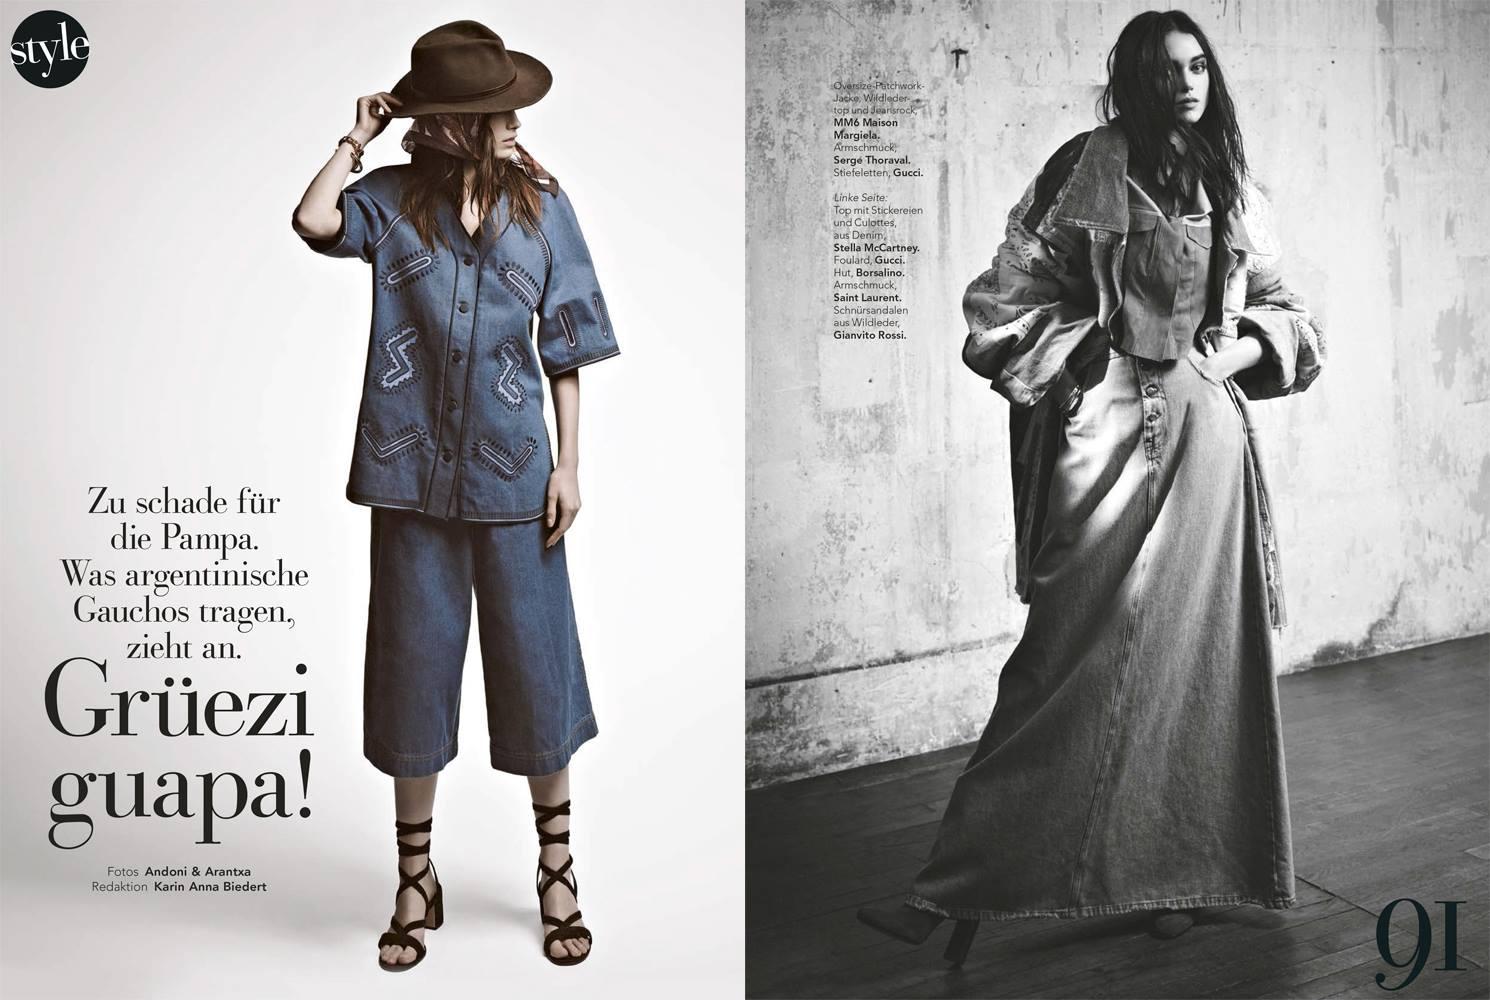 SiStyle April 2015 | Andoni & Arantxa | SI Style | Karin Anna Biedert | Numerique Retouch Photo Retouching Studio